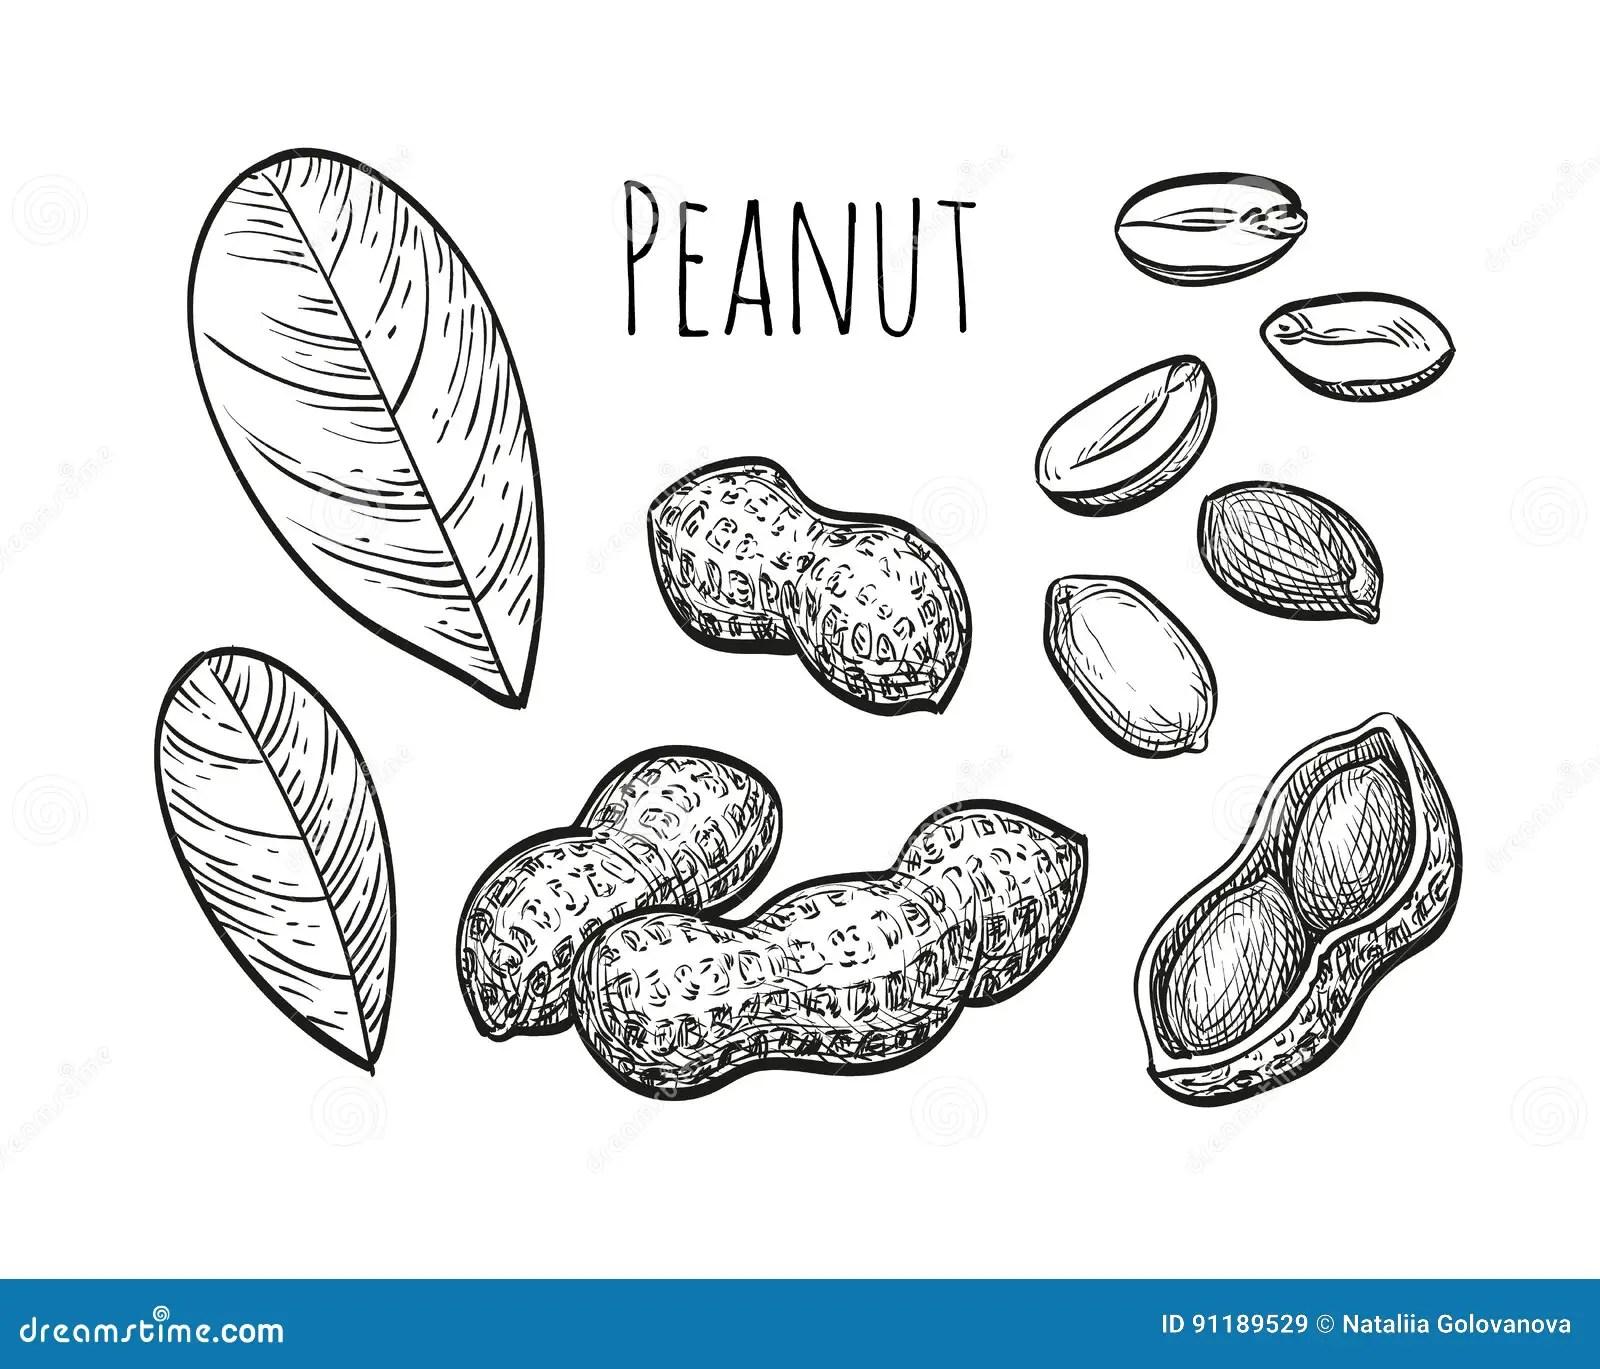 Peanut Cartoons Illustrations Amp Vector Stock Images